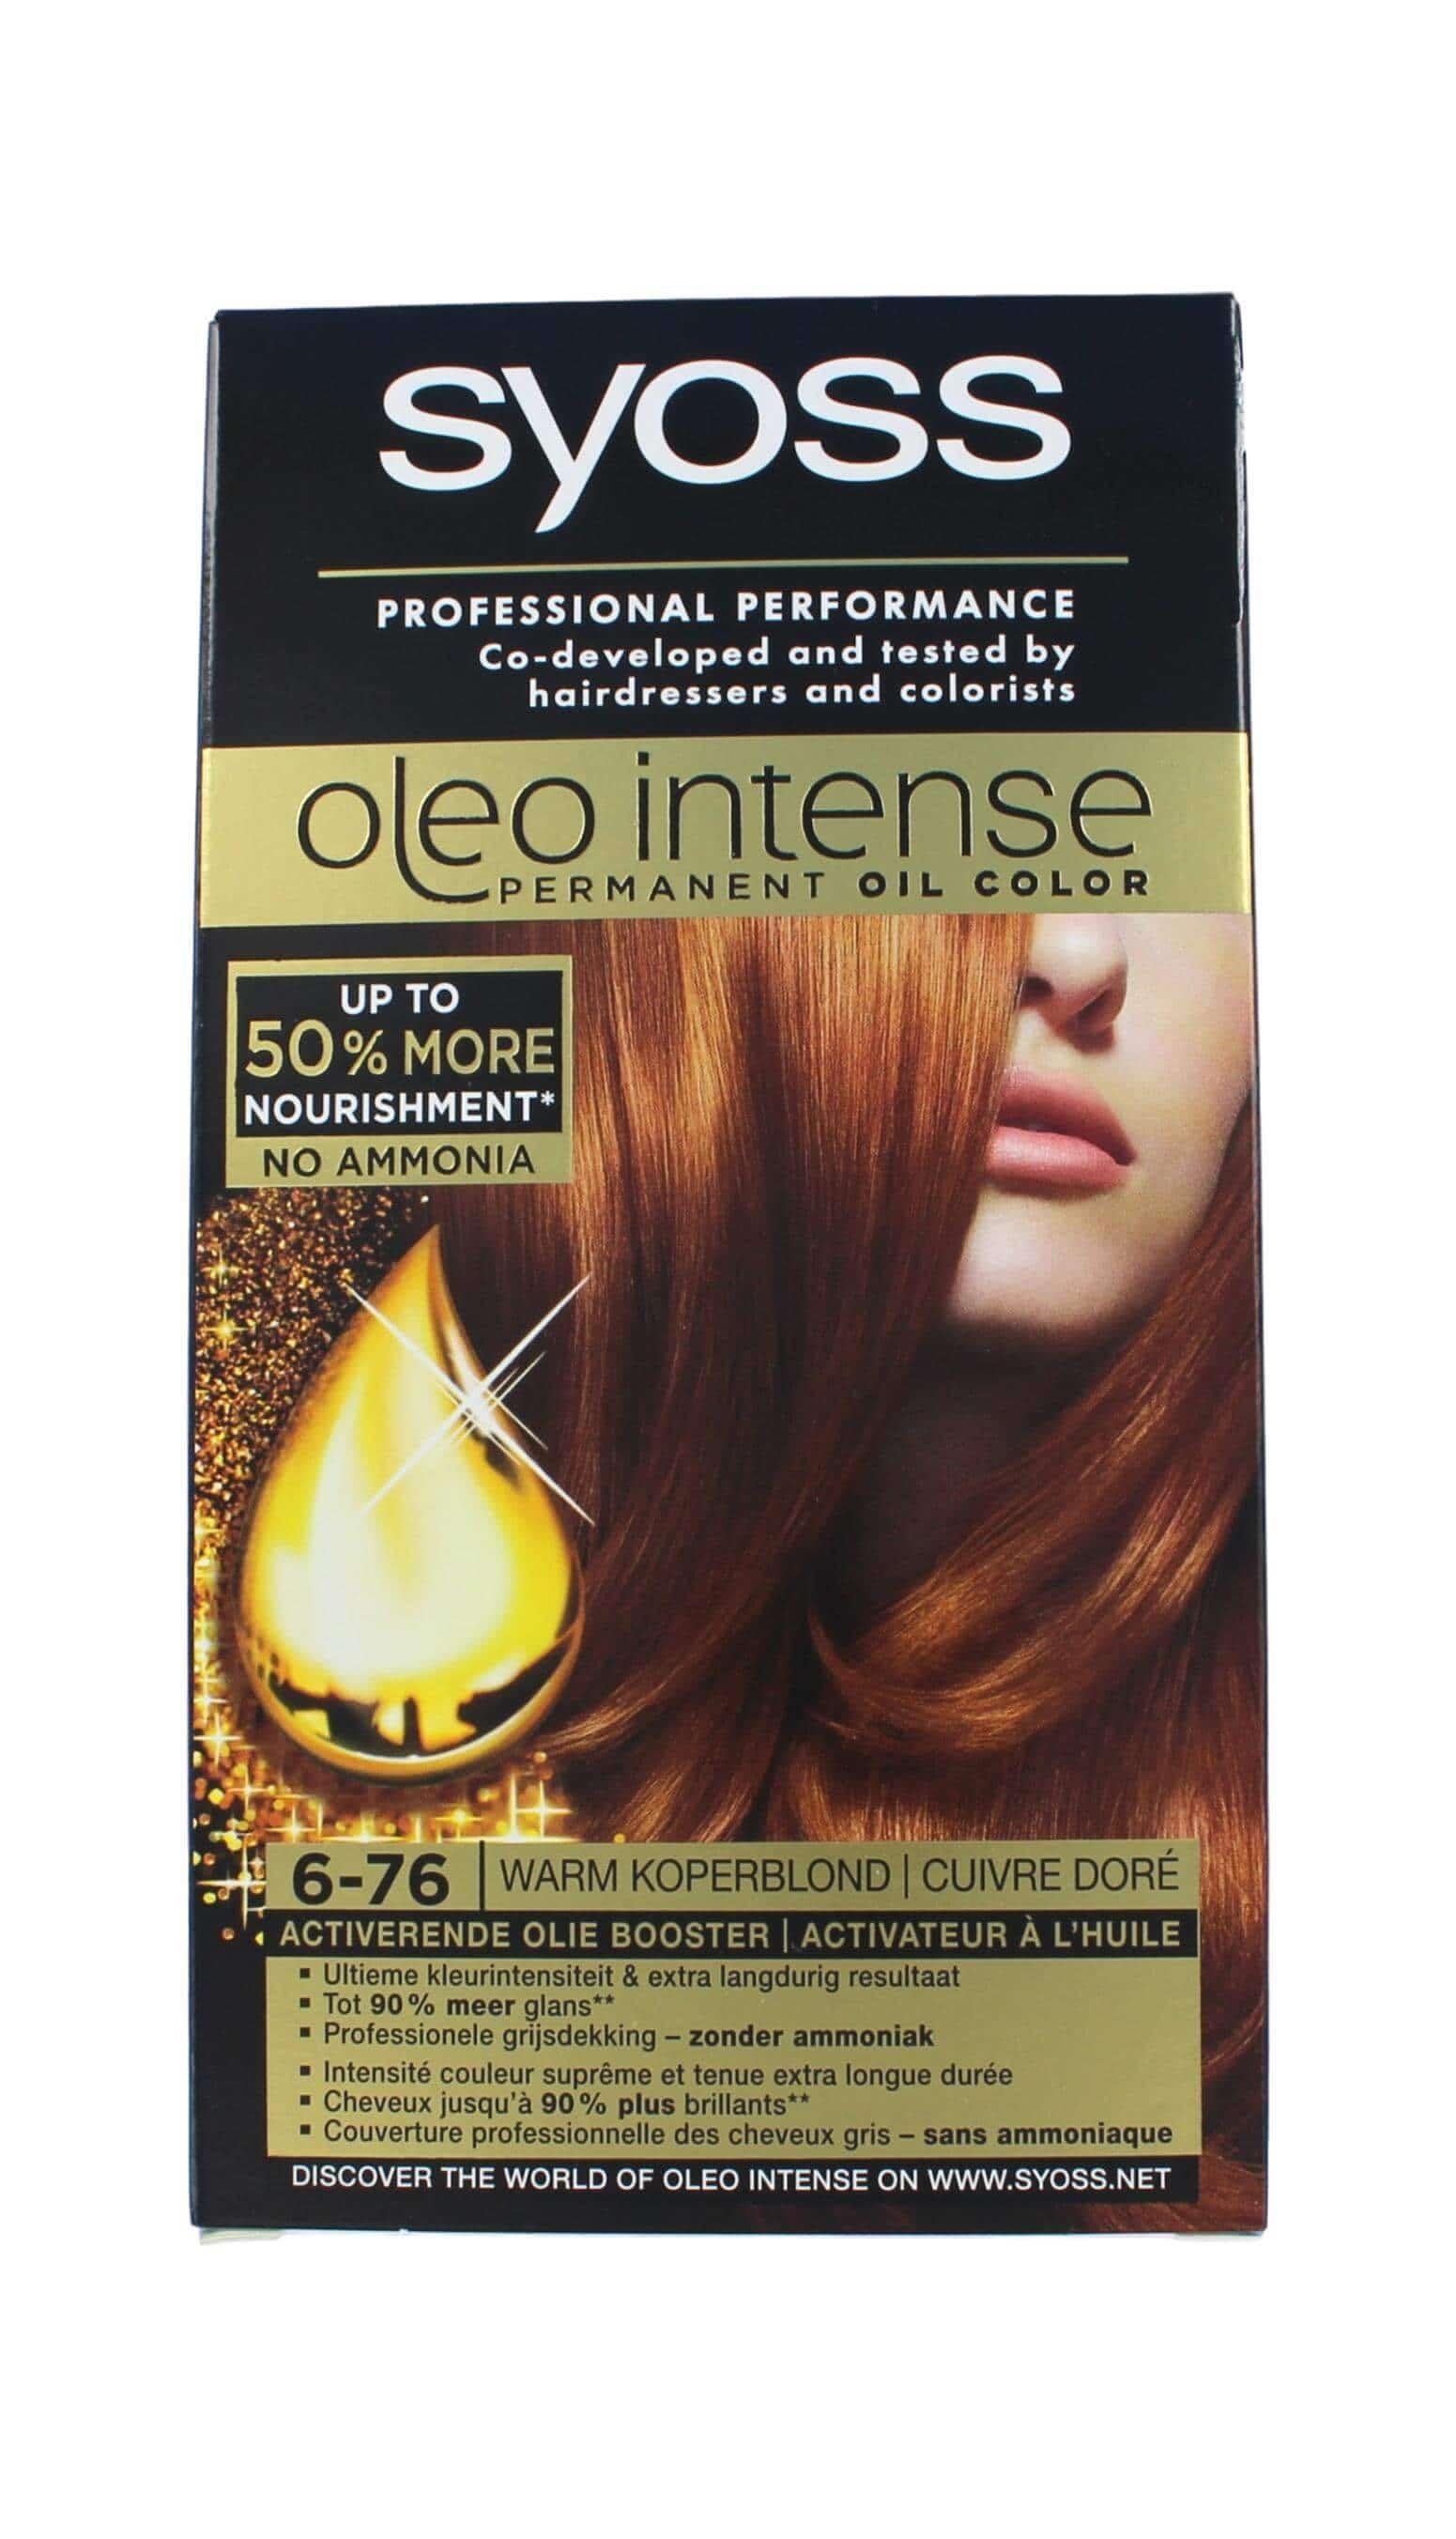 Syoss Oleo Intense Haarverf 6-76 Warm Koperblond